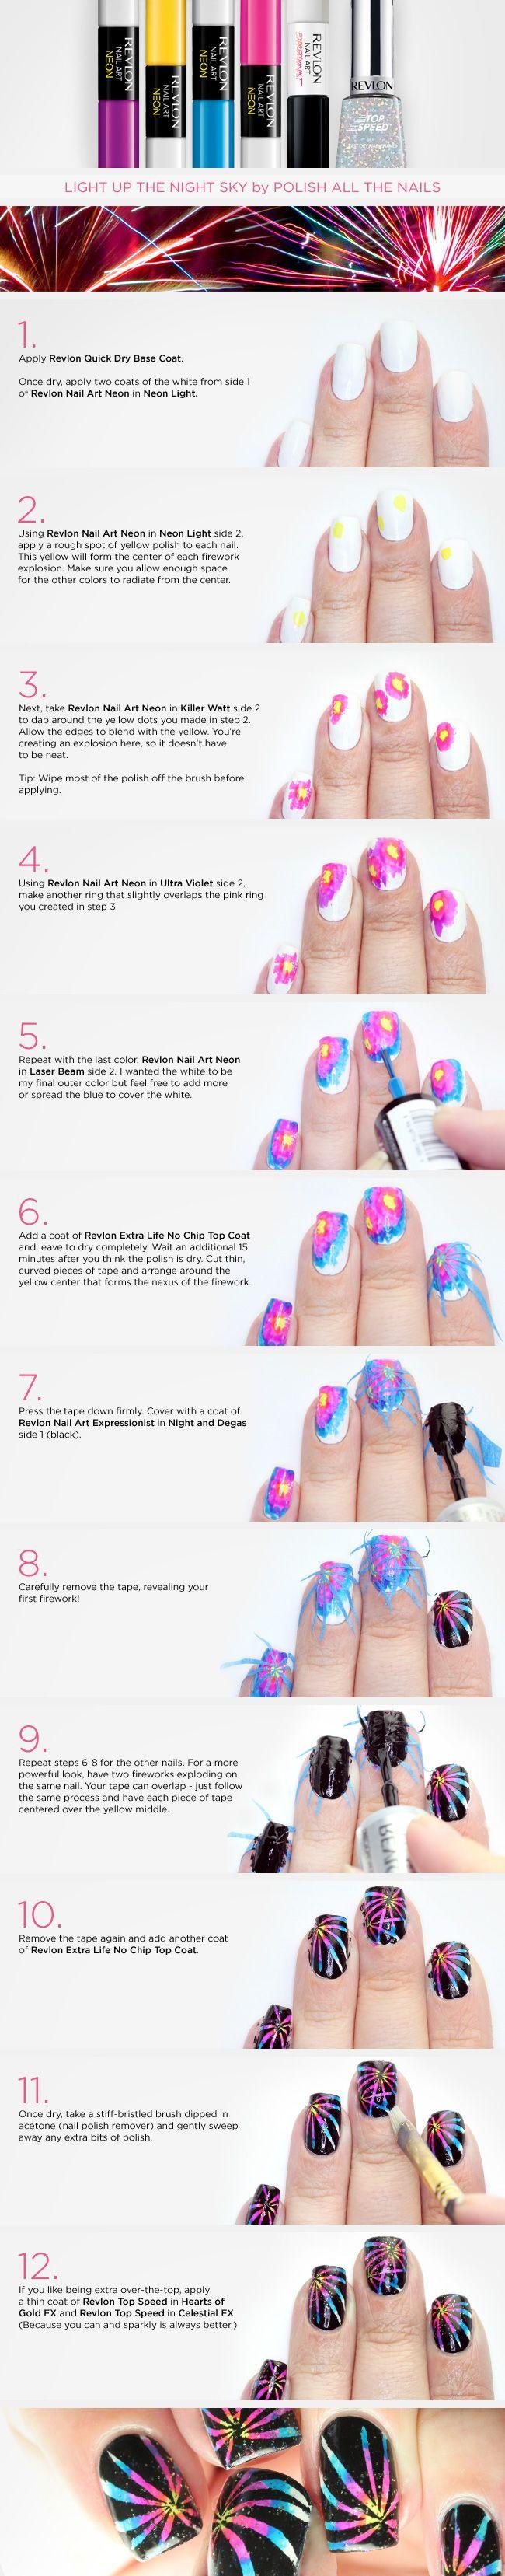 Light up the night - fireworks mani tutorial | Polish All the Nails for Revlon